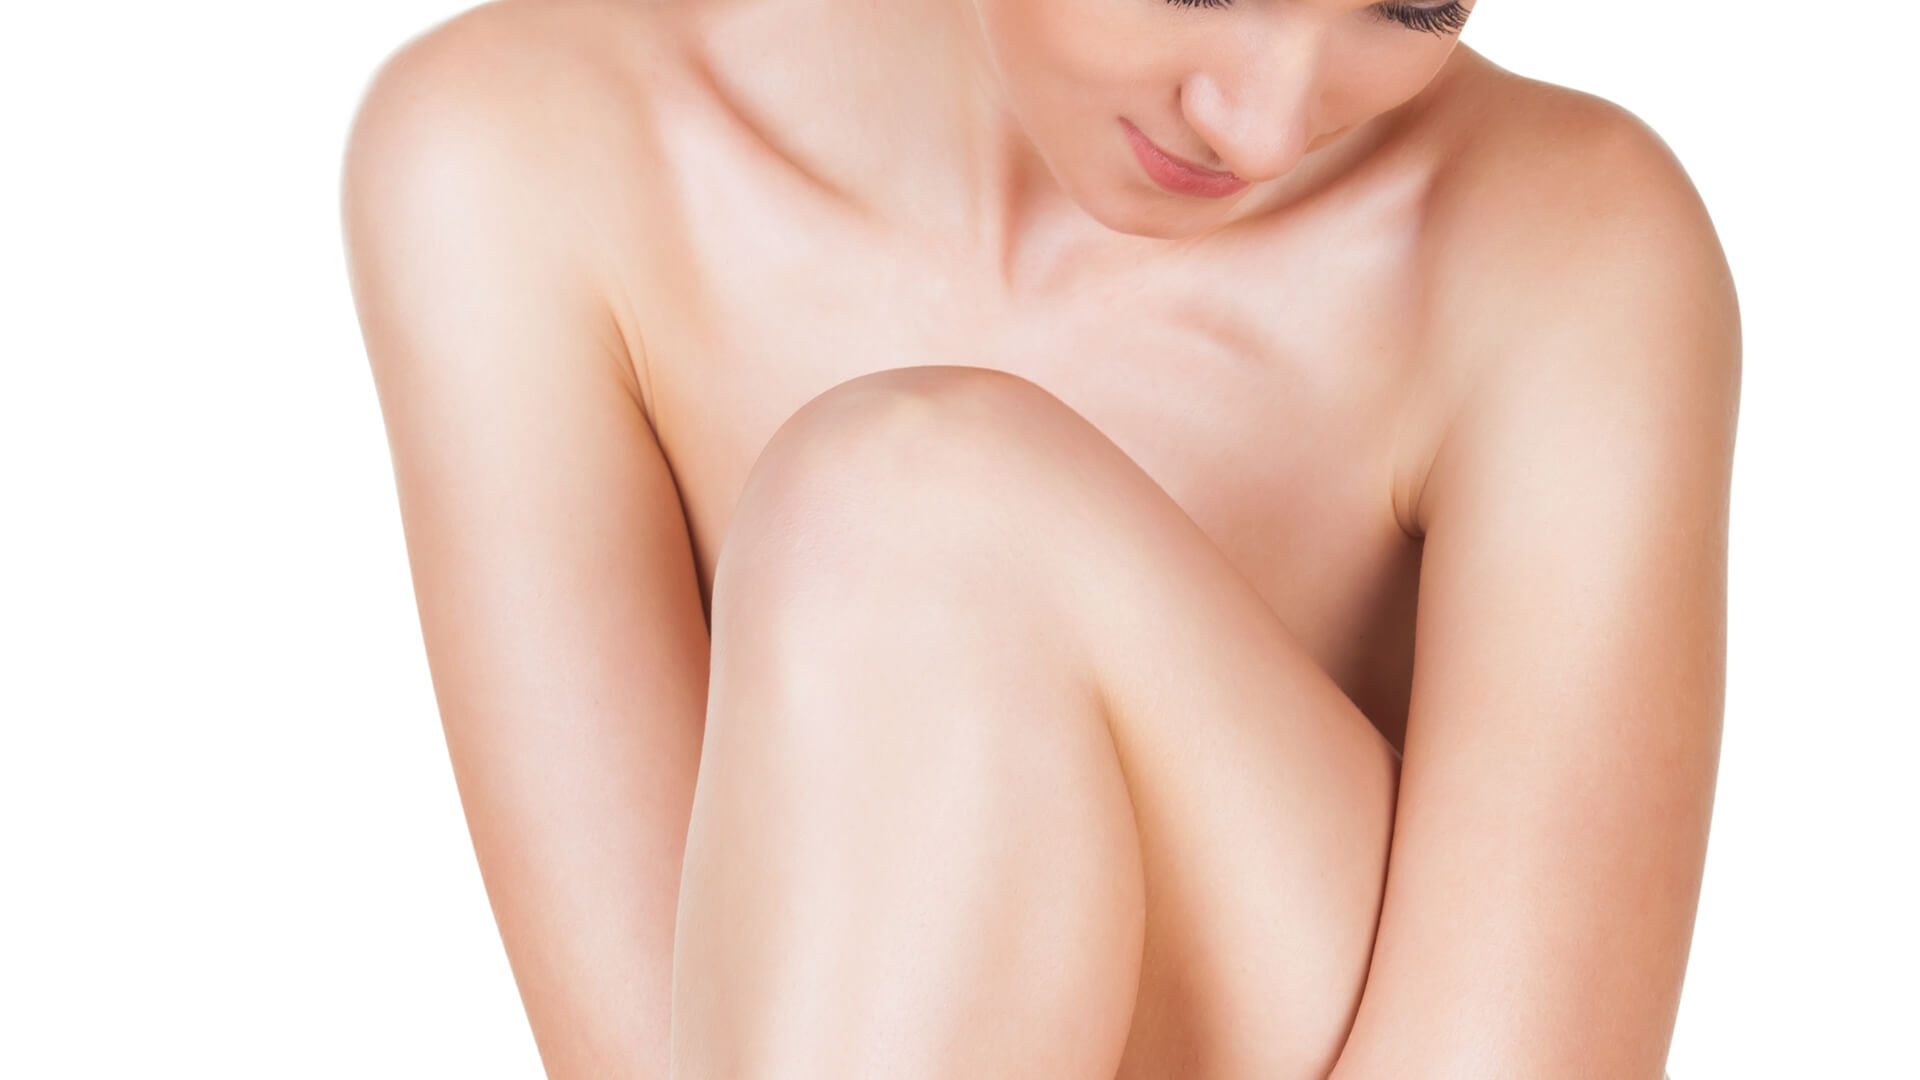 woman_body image